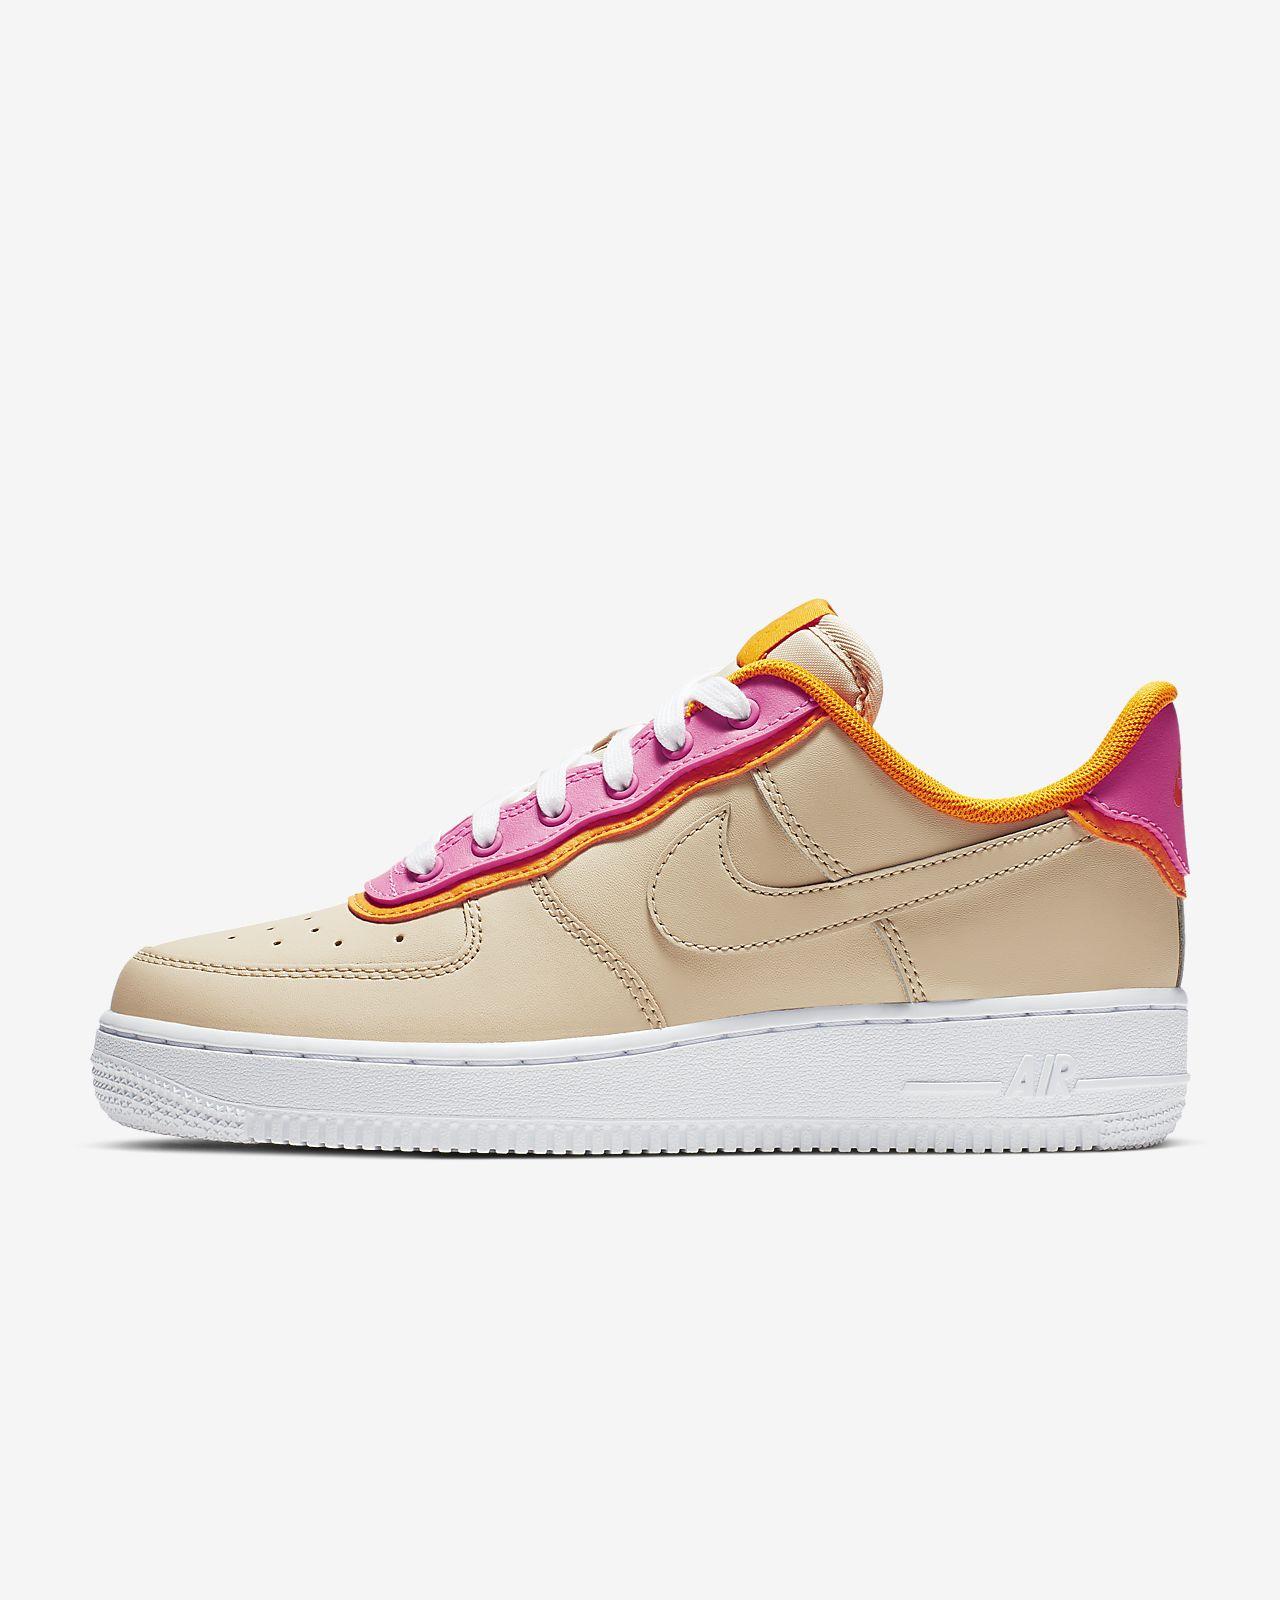 Nike Air Force 1 '07 SE Suede Women's Shoe